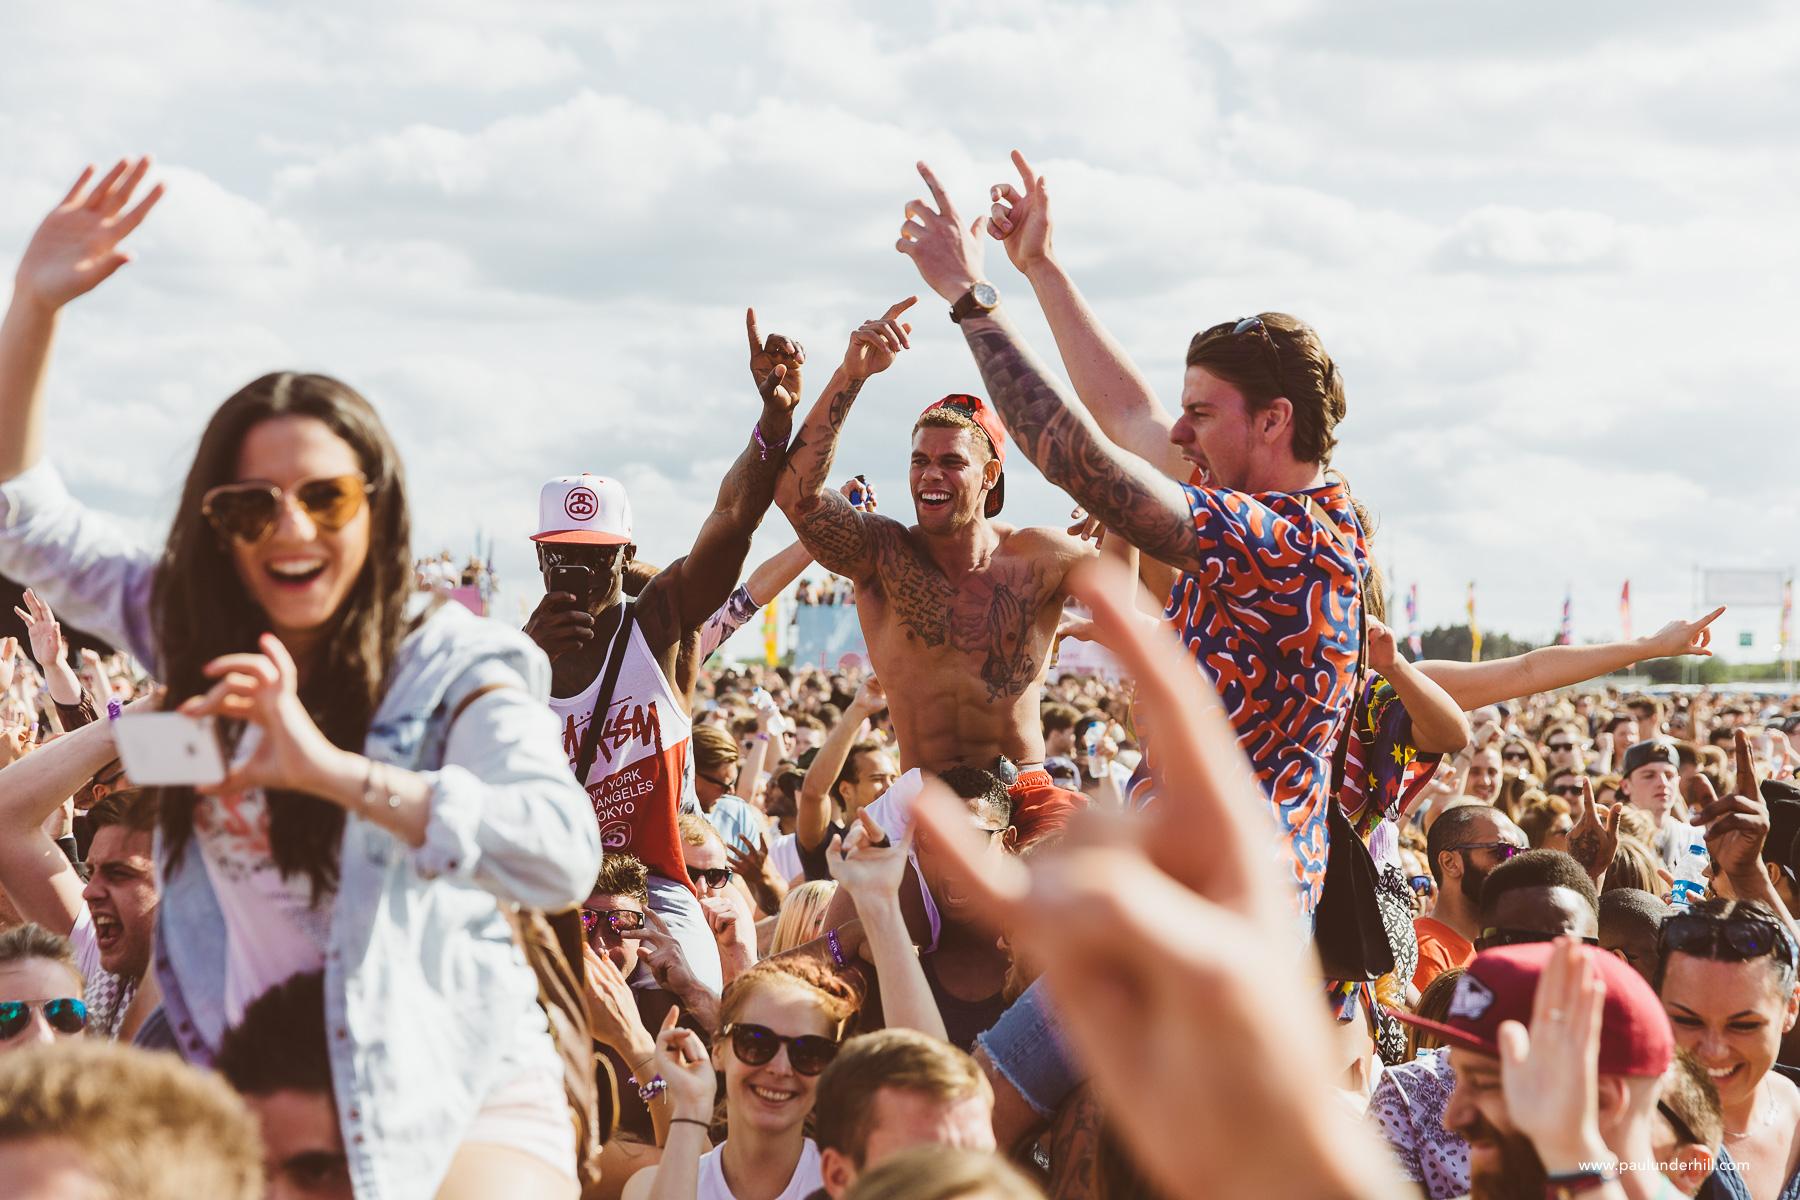 Lifestyle-photography-music-festivals-00009